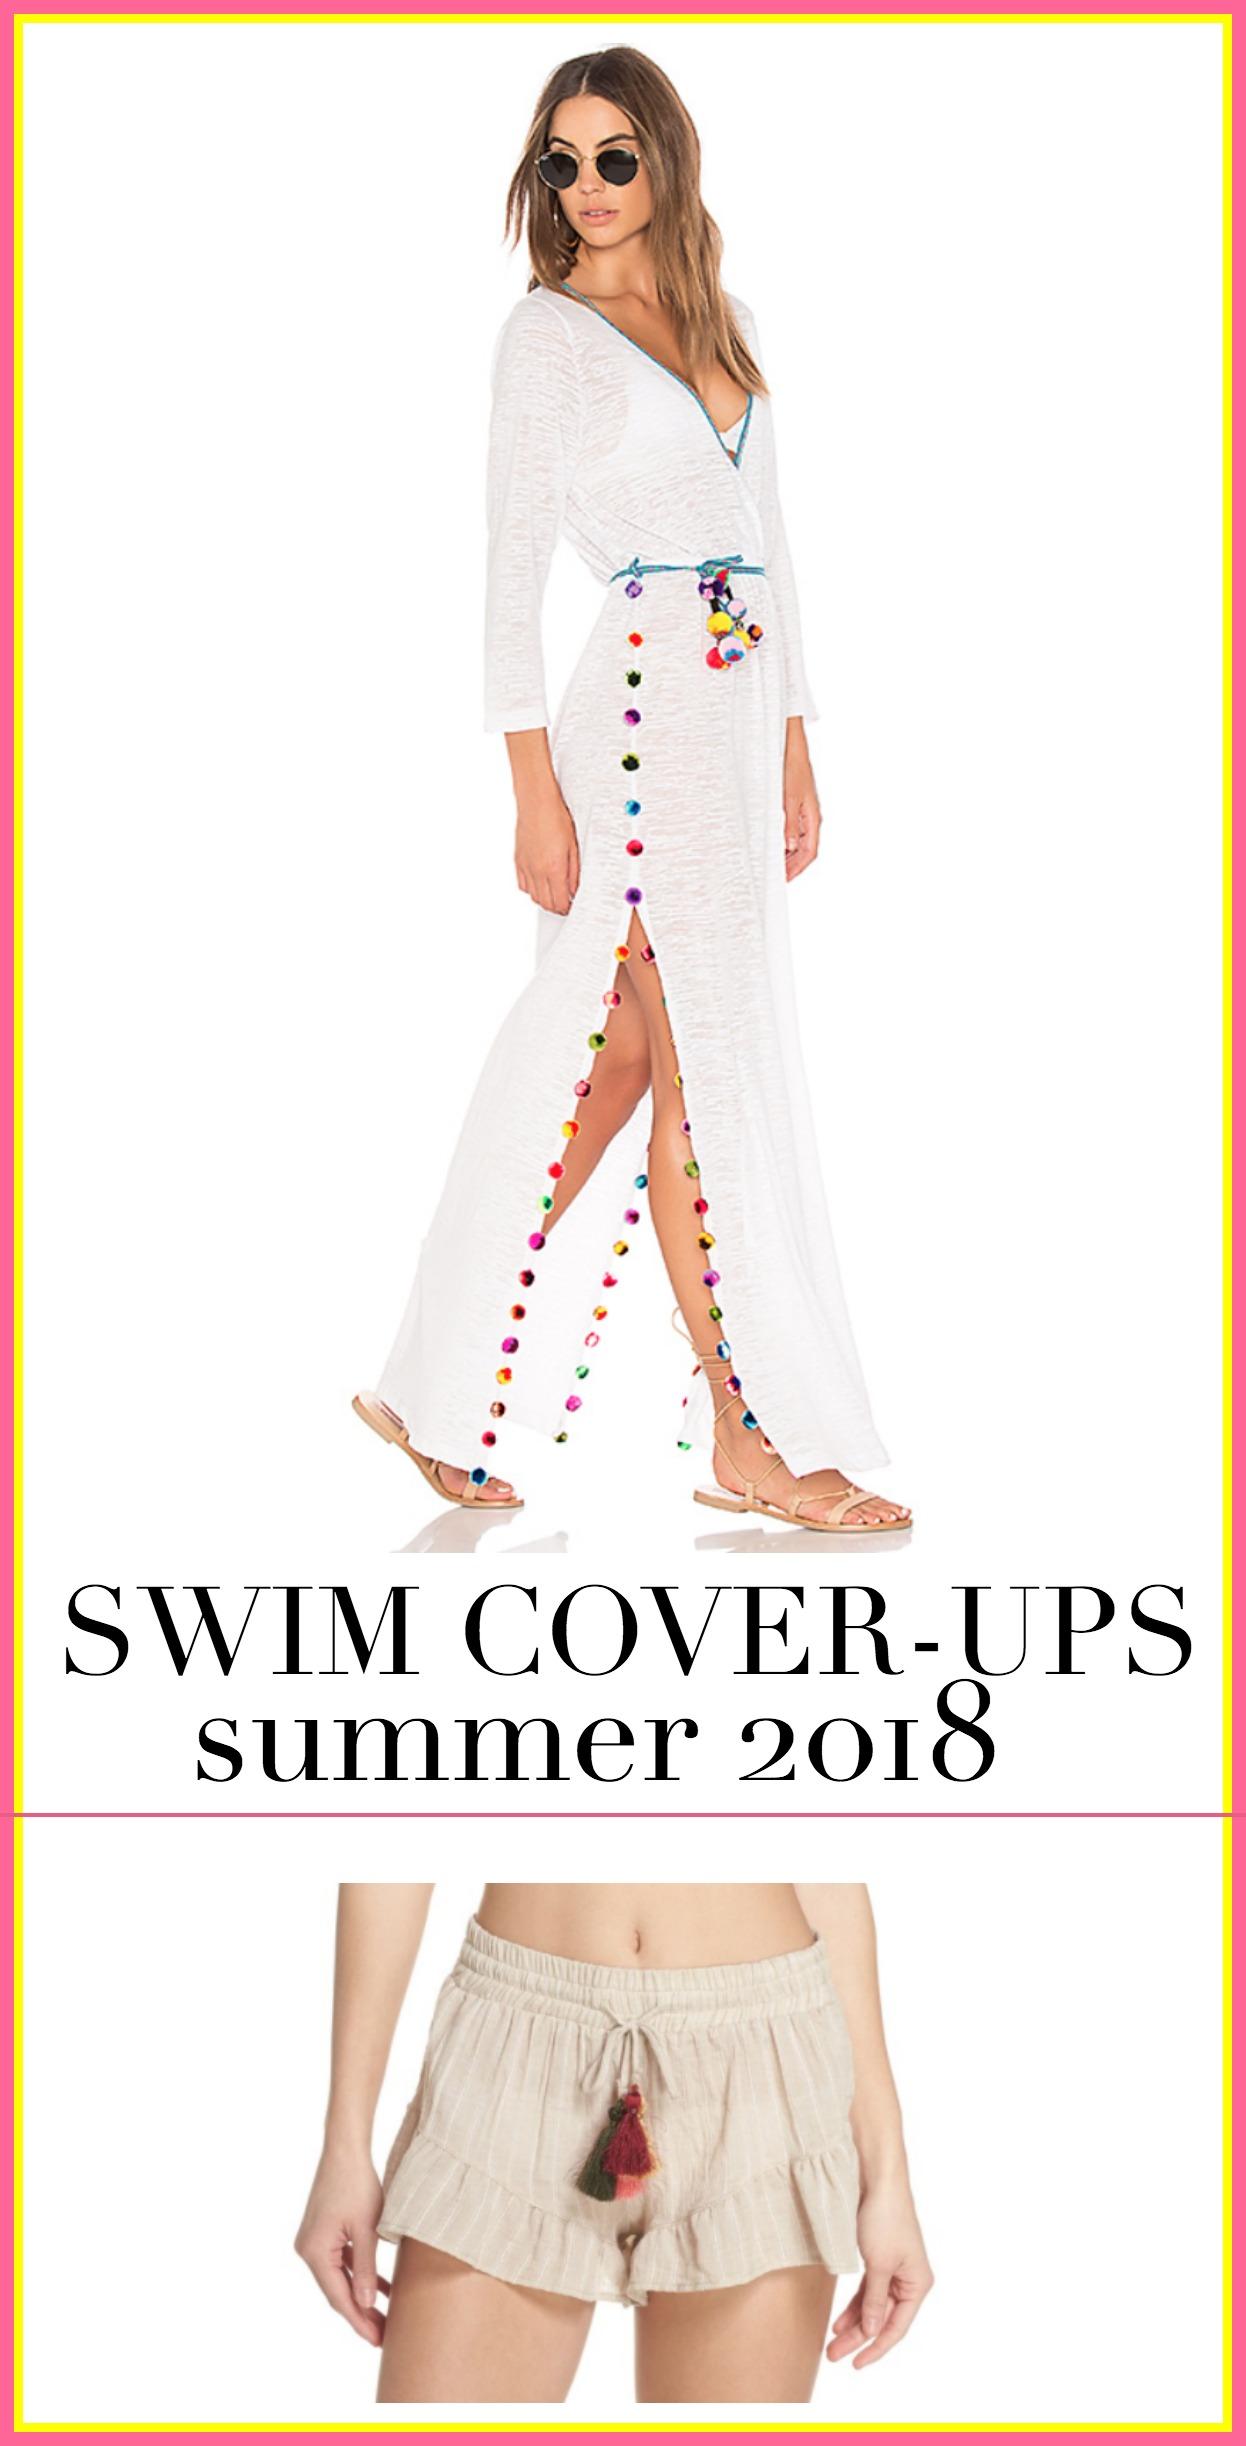 swimwear, swimwear 2018, swimsuit coverups, swim coverups 2018, coverup dresses, coverup pants